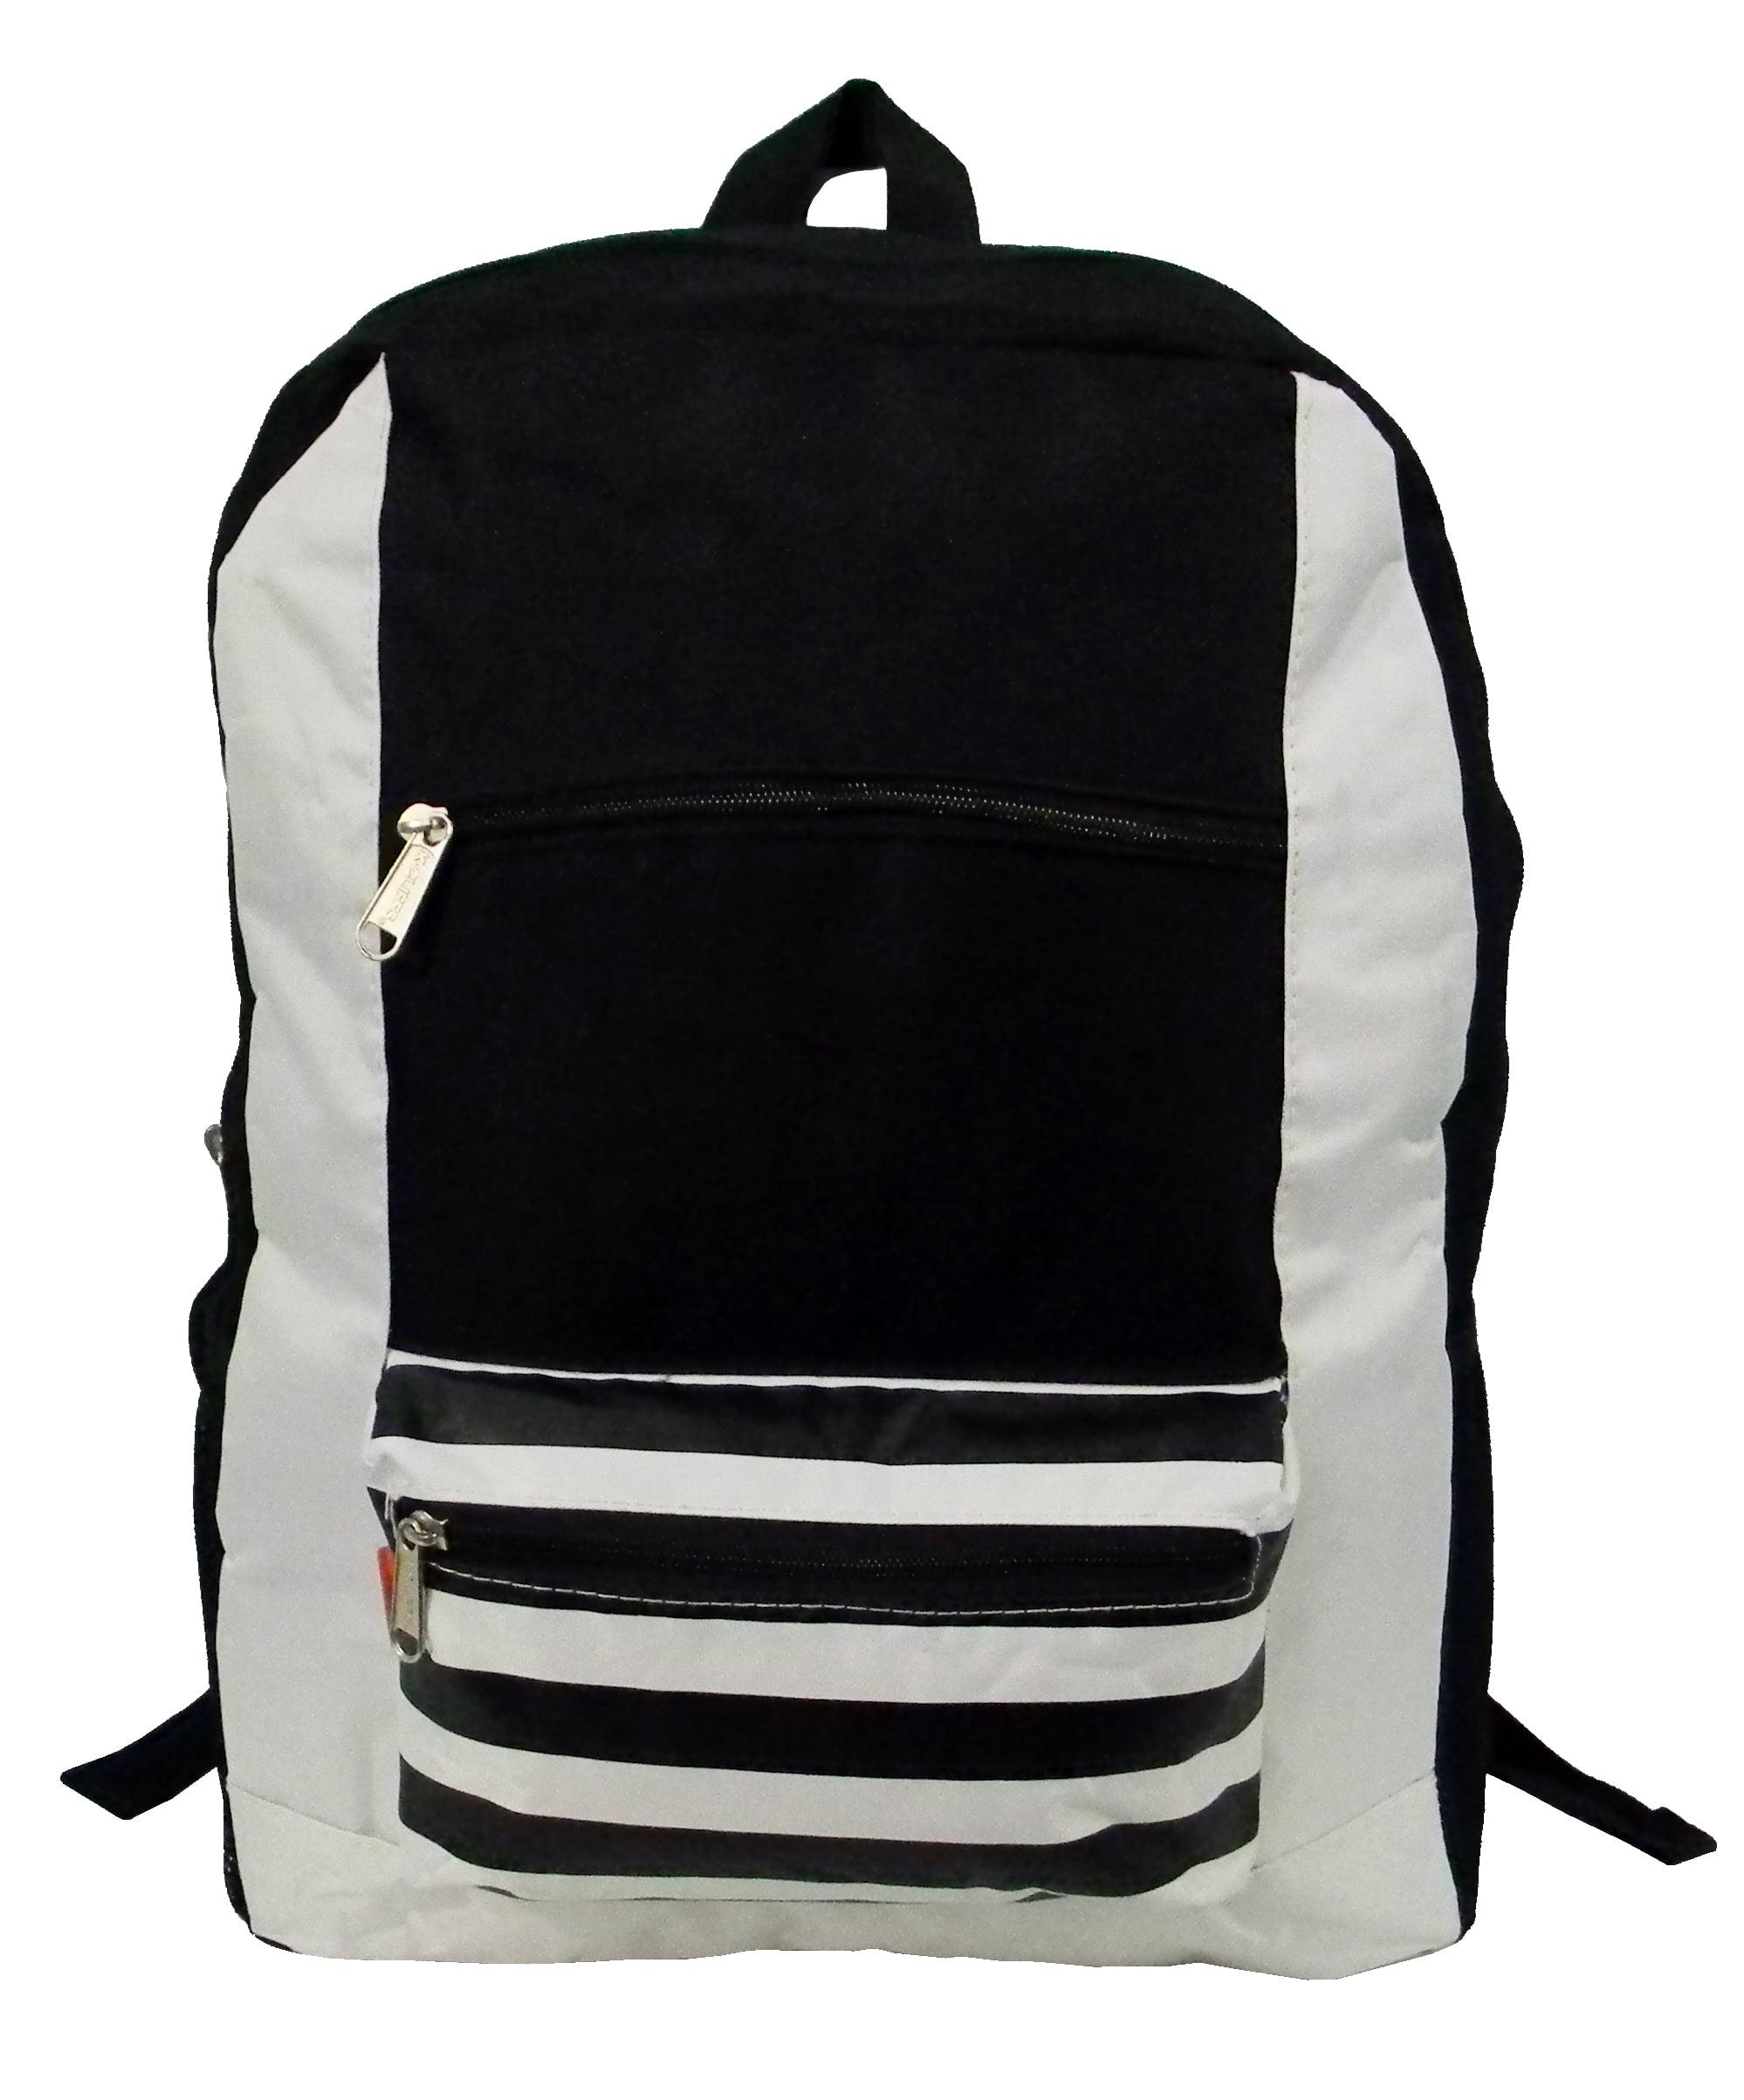 Contrast Backpack 18 School Book Bag Daypack Grey